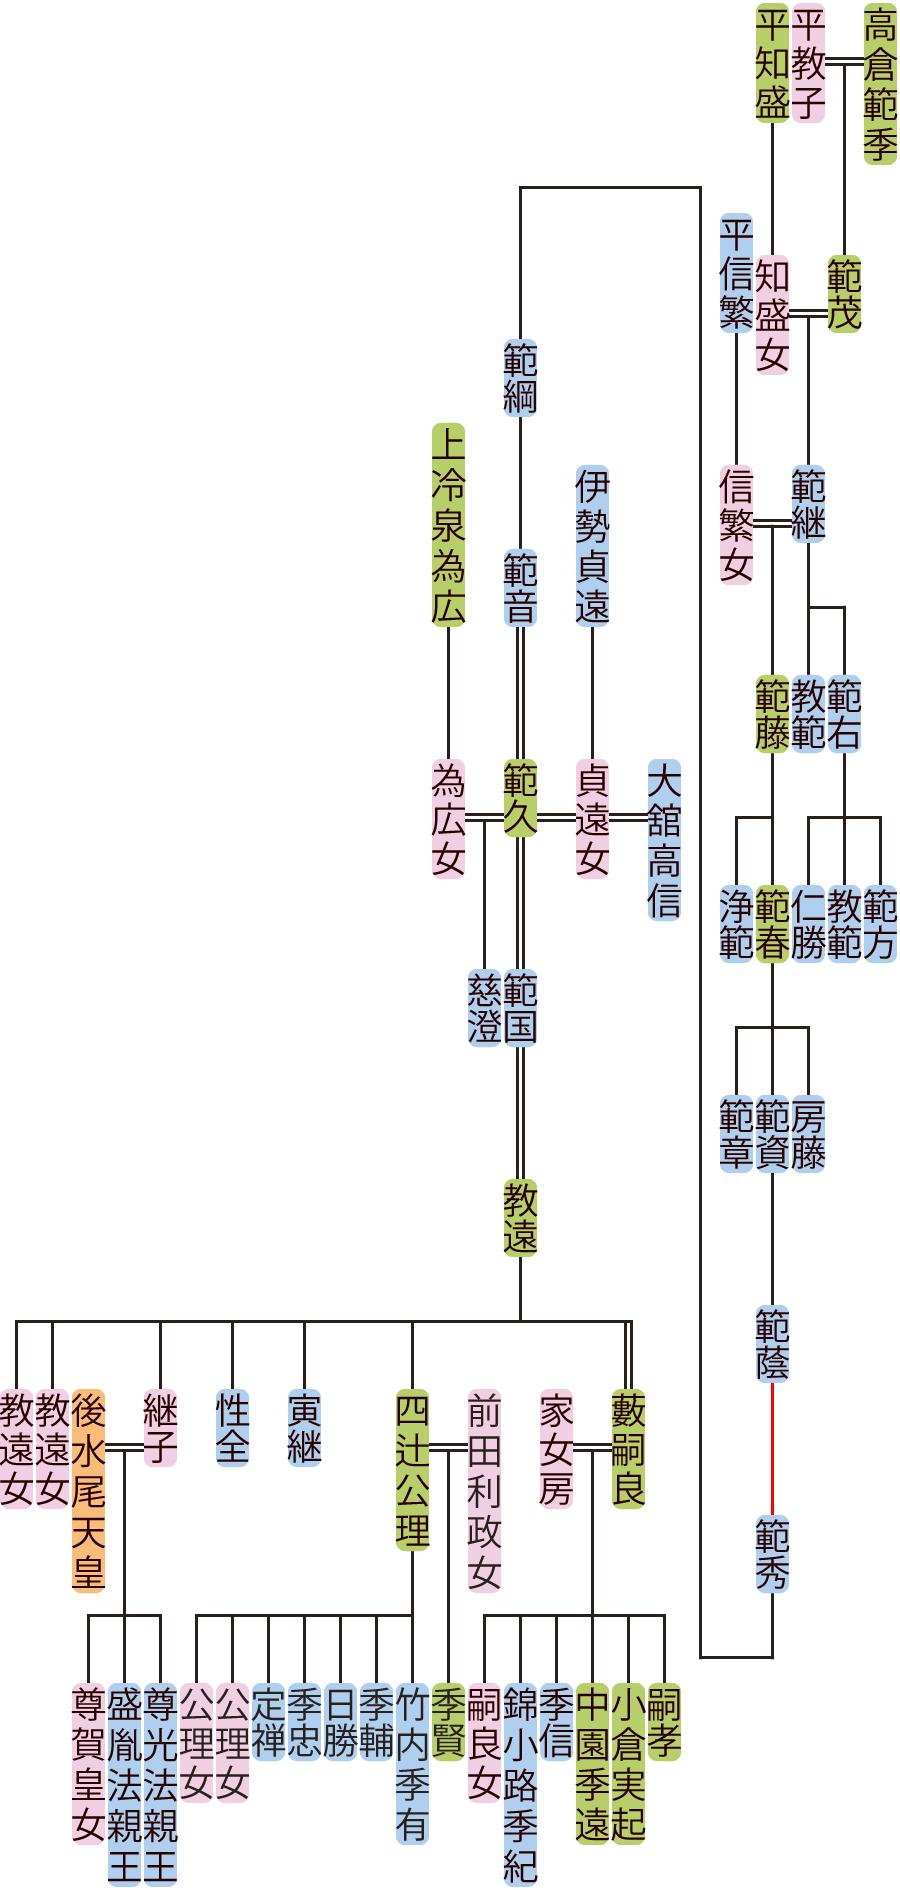 高倉範継~教遠の系図